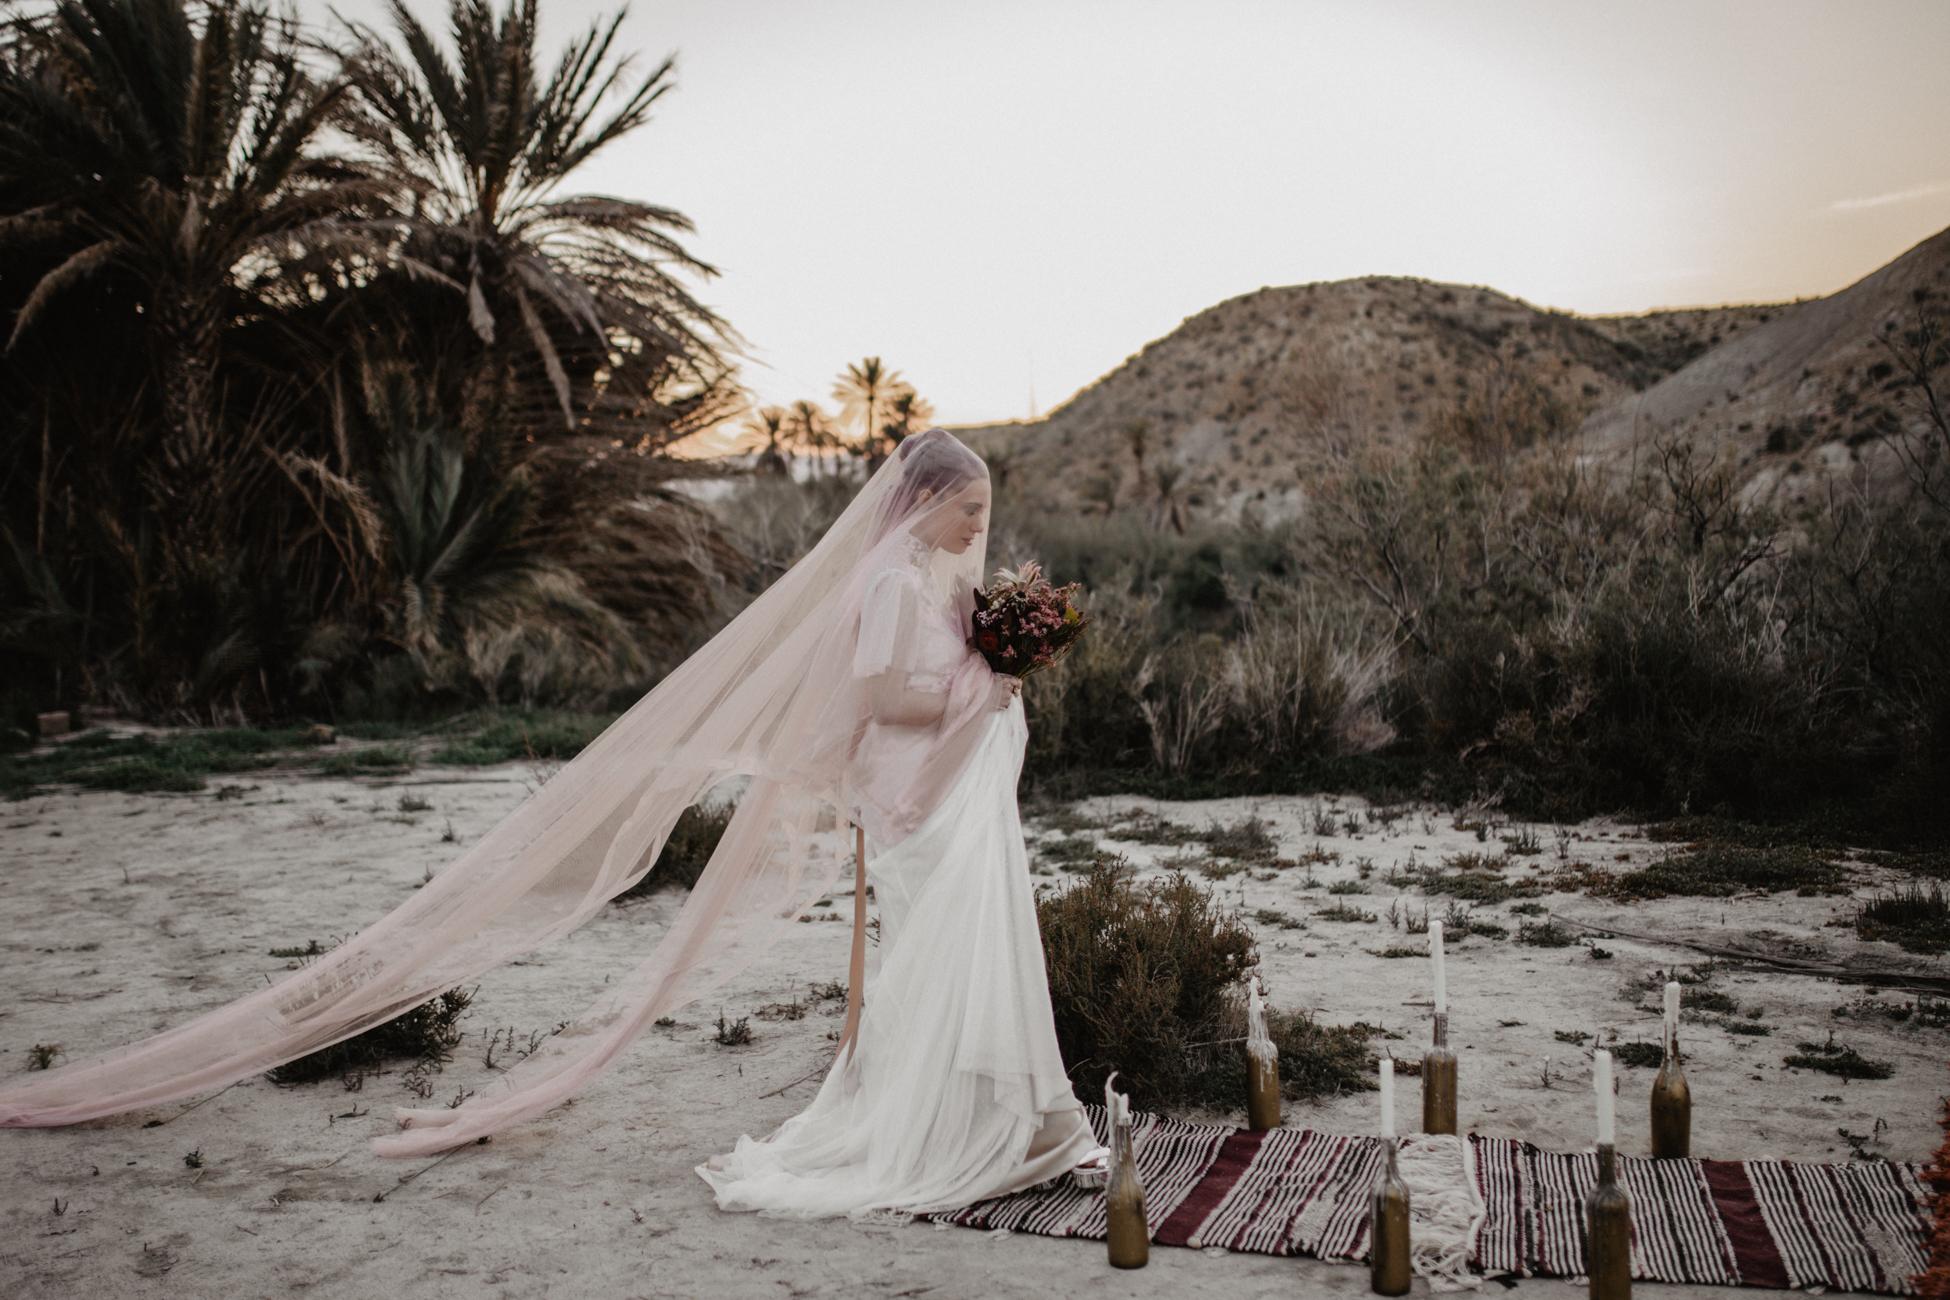 thenortherngirlphotography_photography_thenortherngirl_rebeccascabros_wedding_weddingphotography_weddingphotographer_wood_muebles_deco_bodasdecaramelo_home_bedtime_gaywedding_editorial_desierto_desert_wildestdreams_amortexano-358.jpg